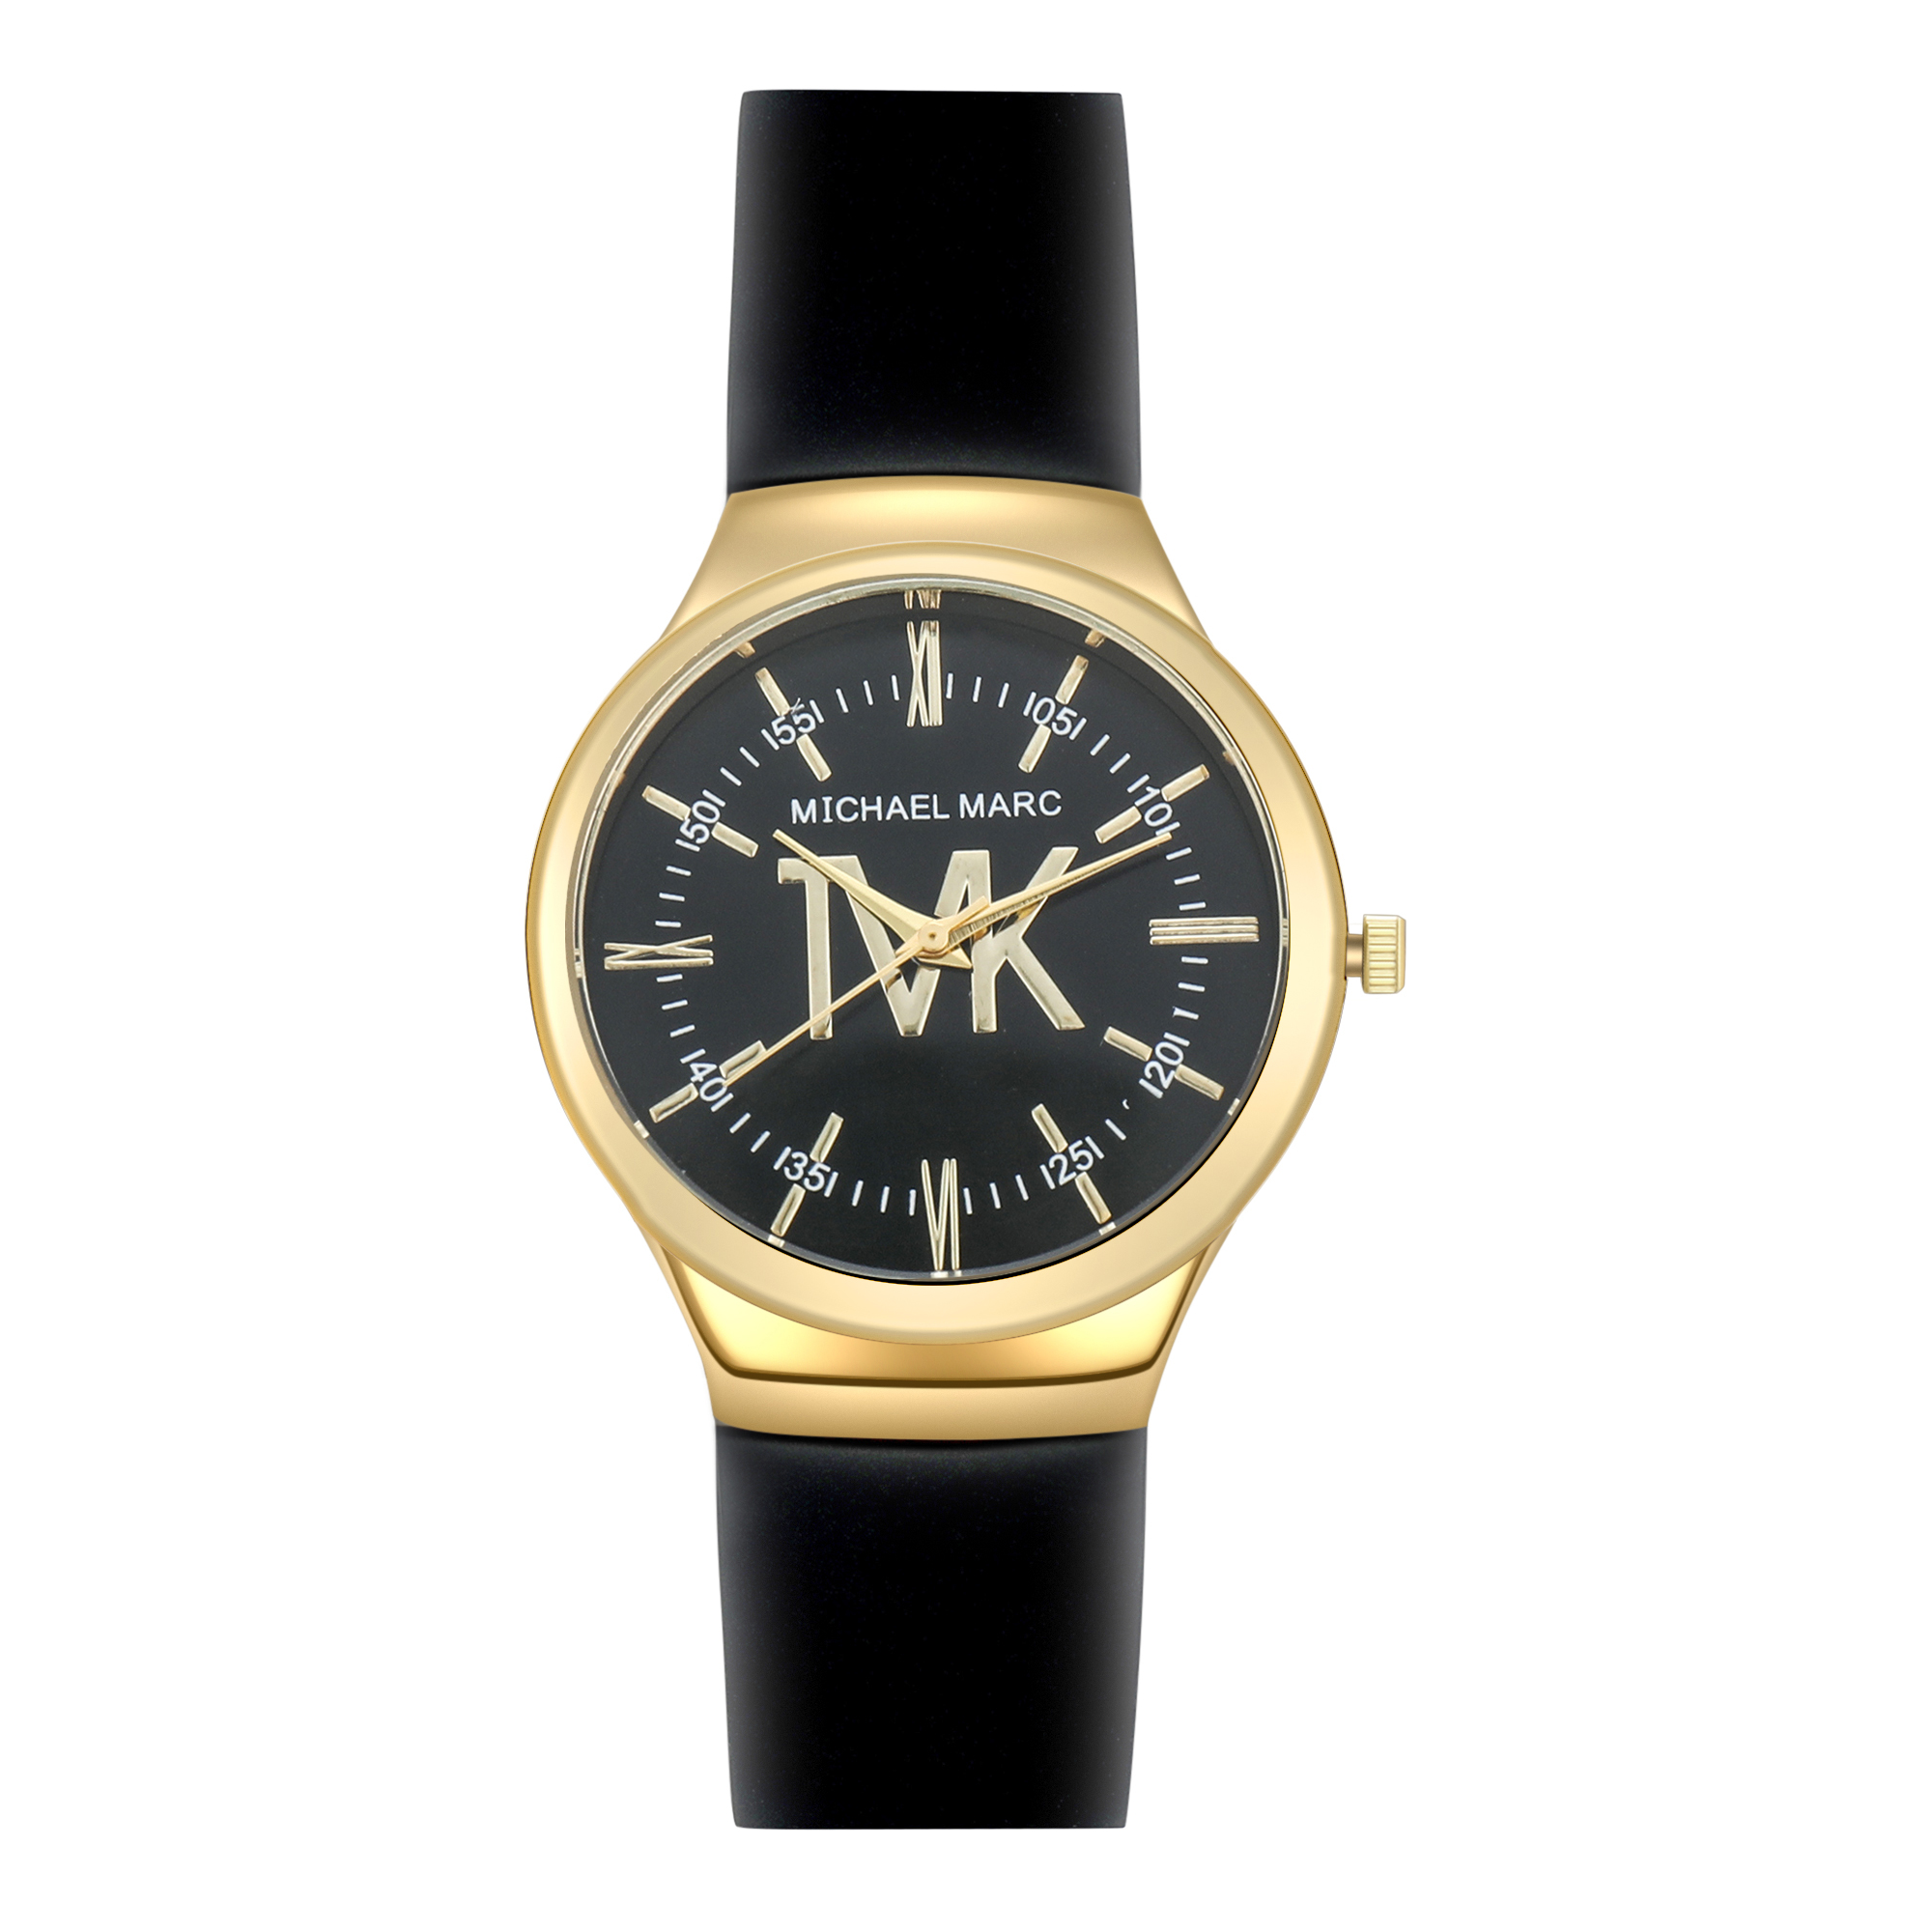 Reloj Mujer Top Brand TVK New Casual Watch Men Women Luxury Famous Wristwatch Analog Quartz Watches Gift Relogio Masculino